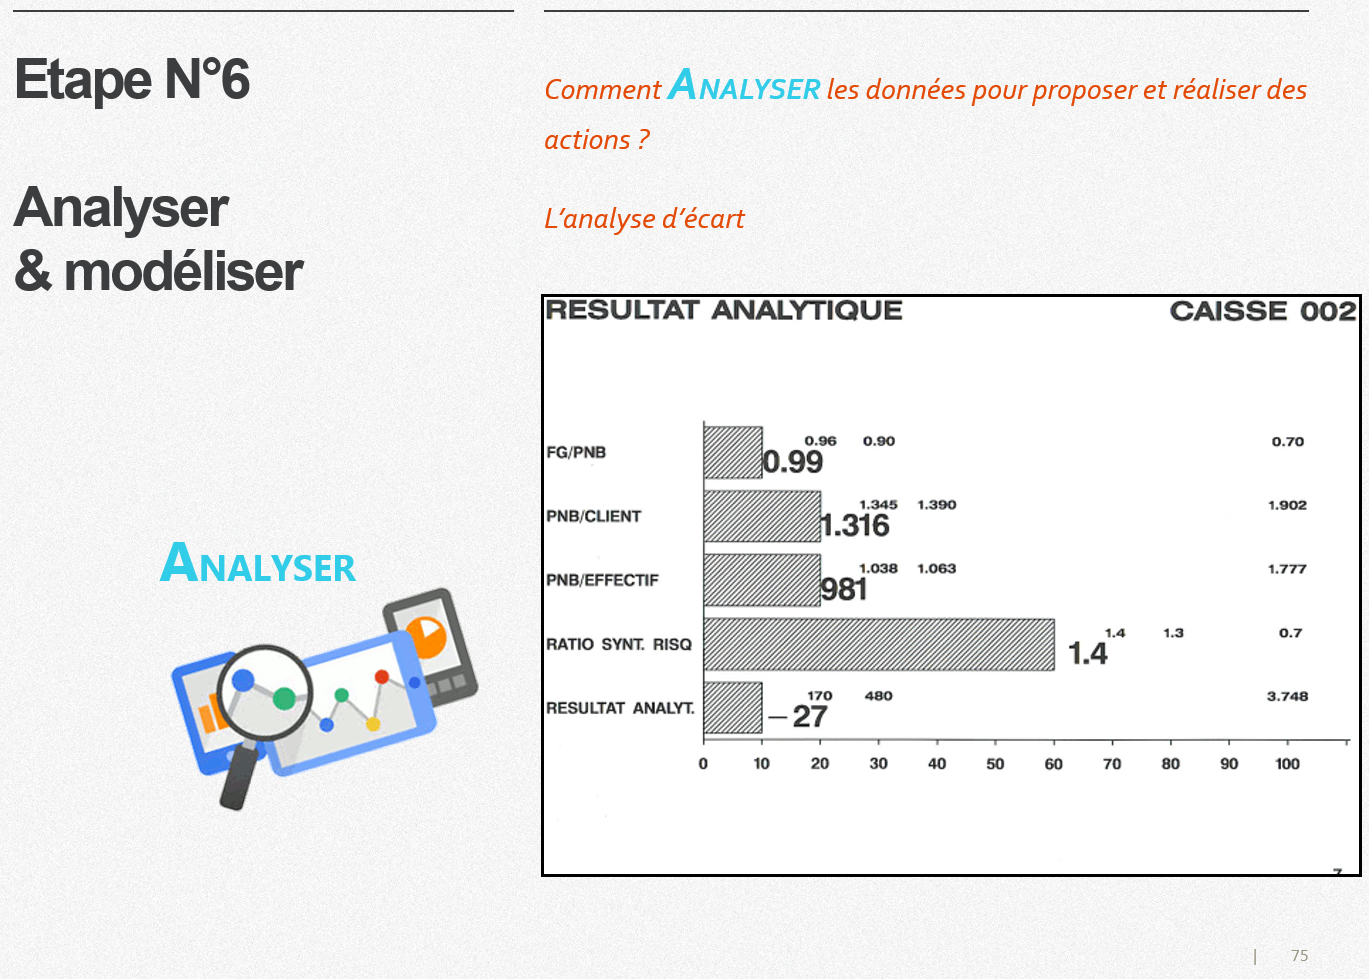 GMKT Slidedoc P75 7 etapes AnaMod9